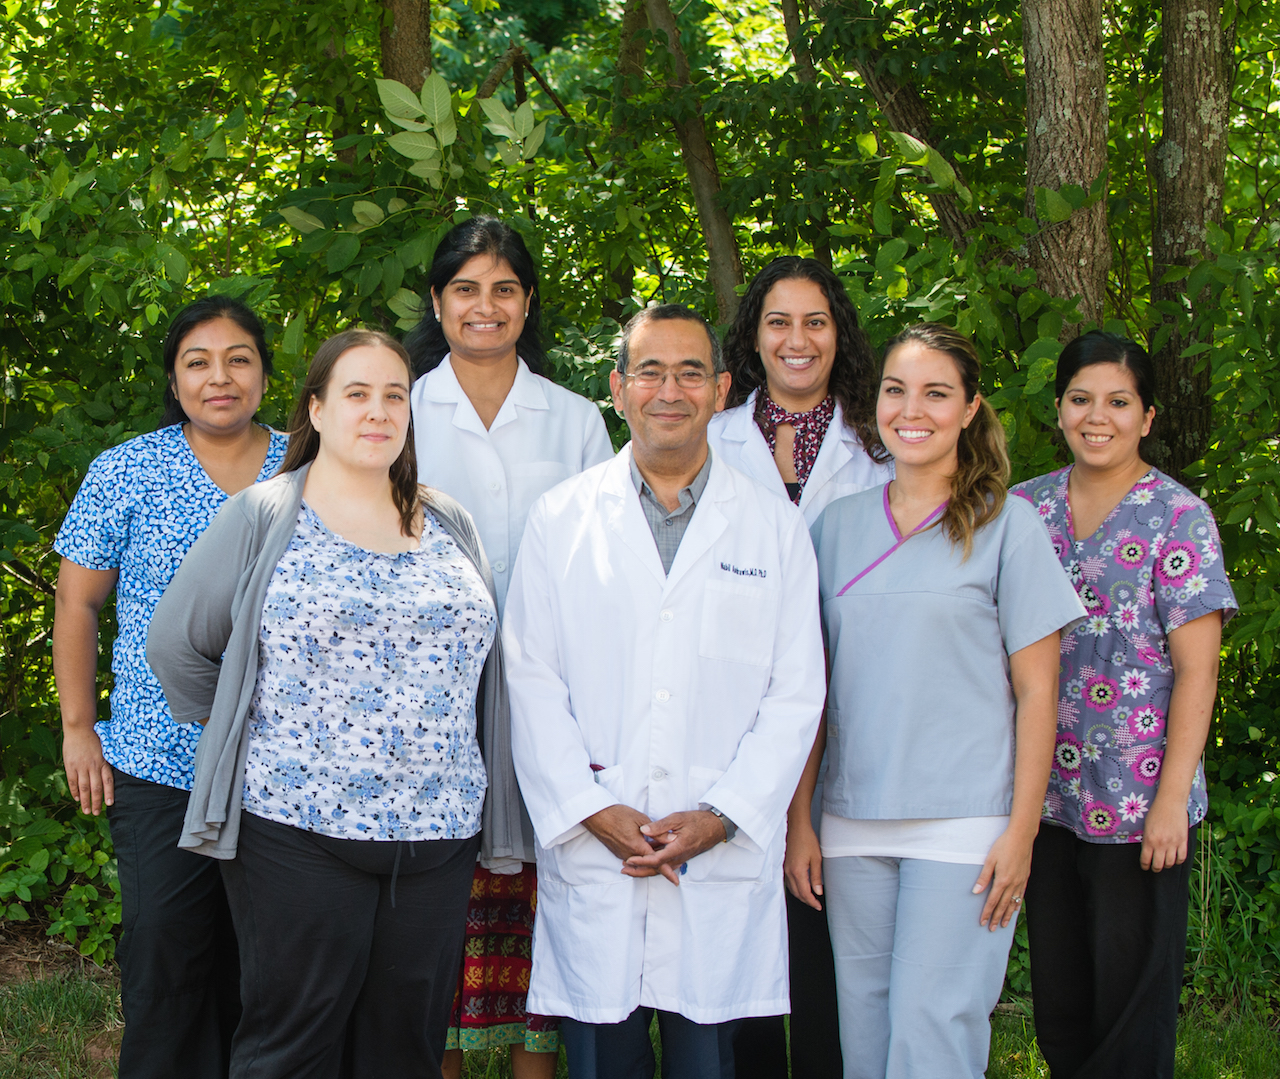 Burke Internal Medicine - Burke, VA doctors